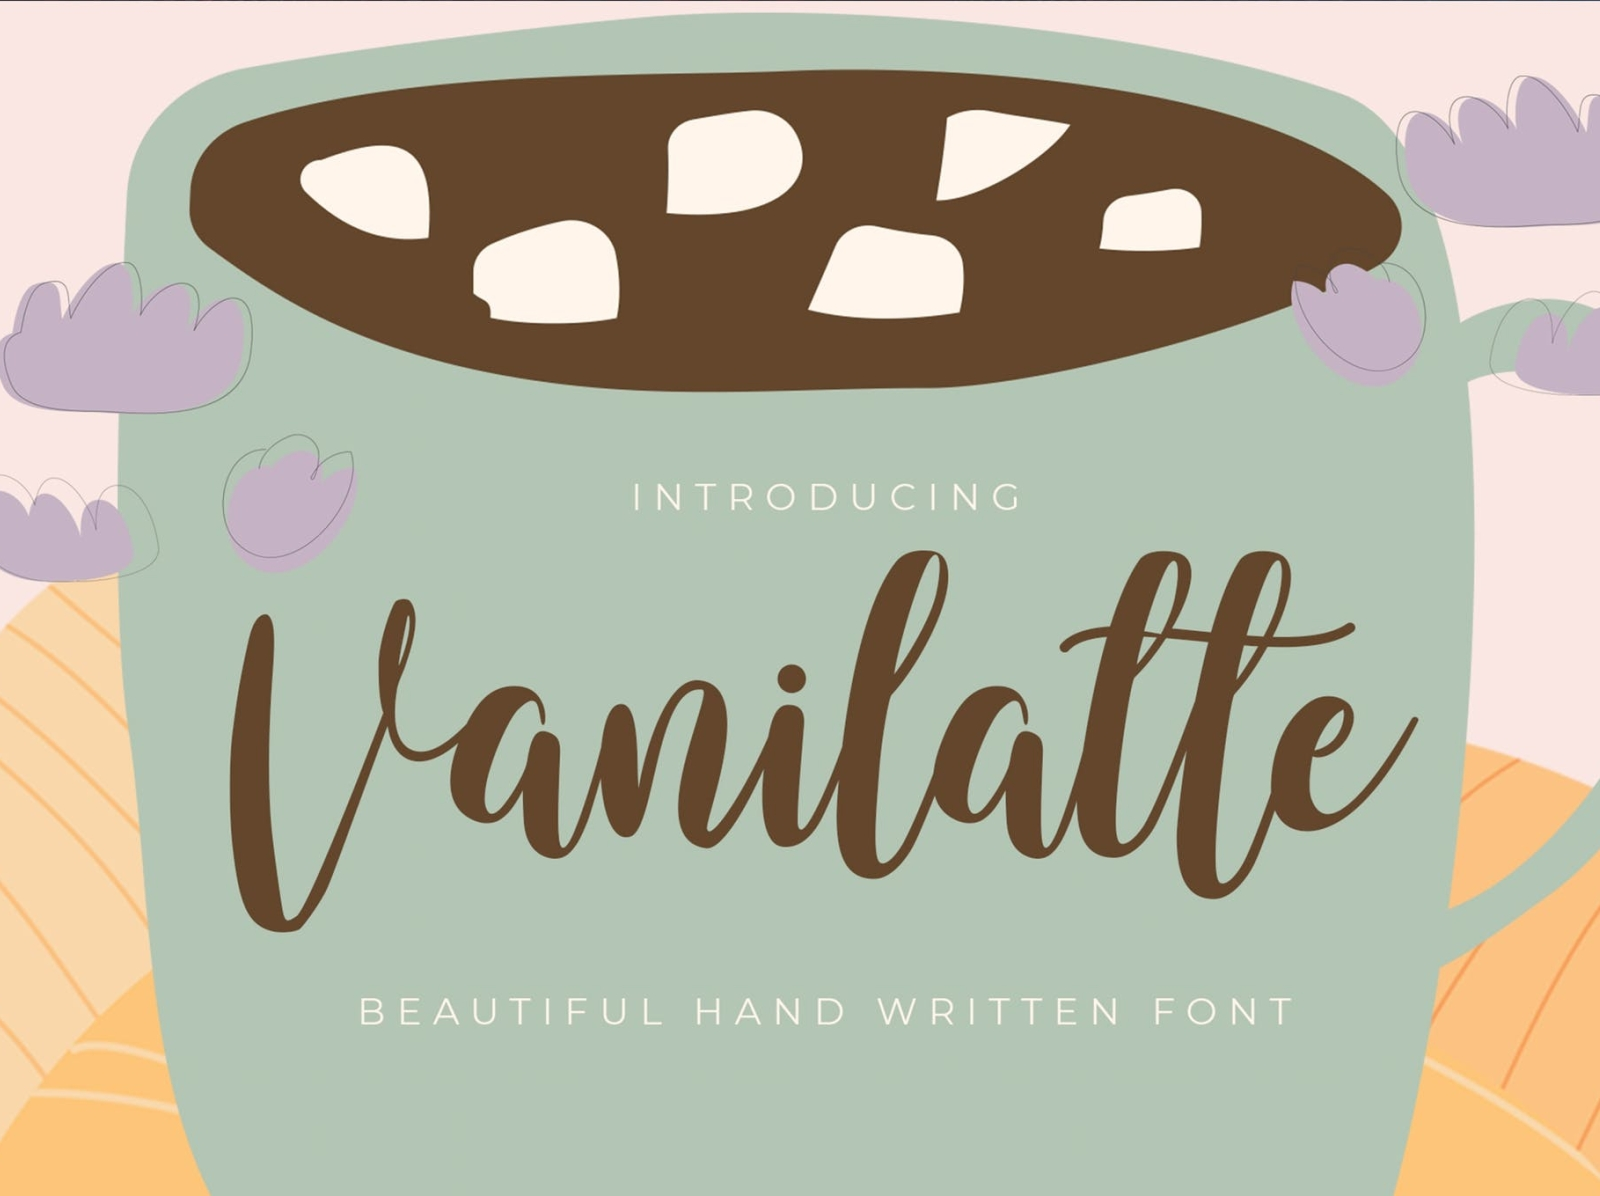 Vanilaate Handwritten Font script font cafe coffee handwritten display script font ux vector ui app logo typography illustration graphic design design branding